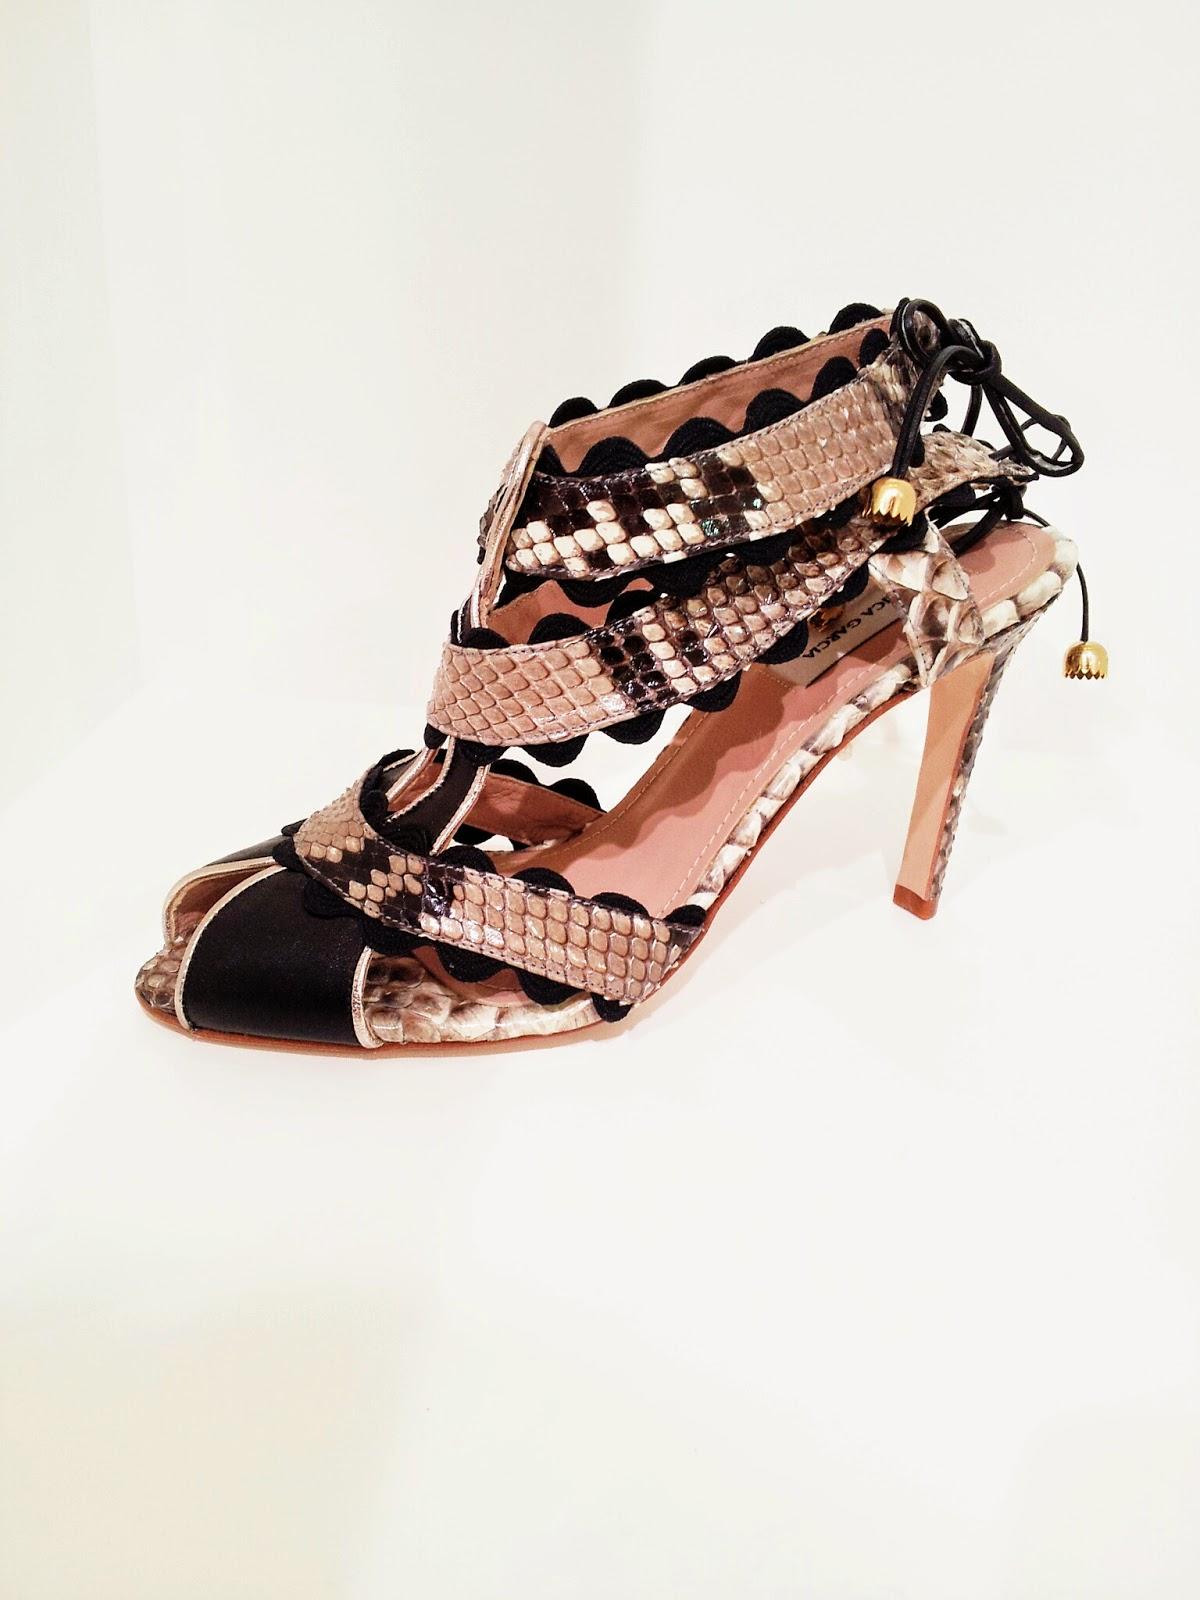 BE FASHIONABLY: M\u00f3nica Garc\u00eda Shoes...